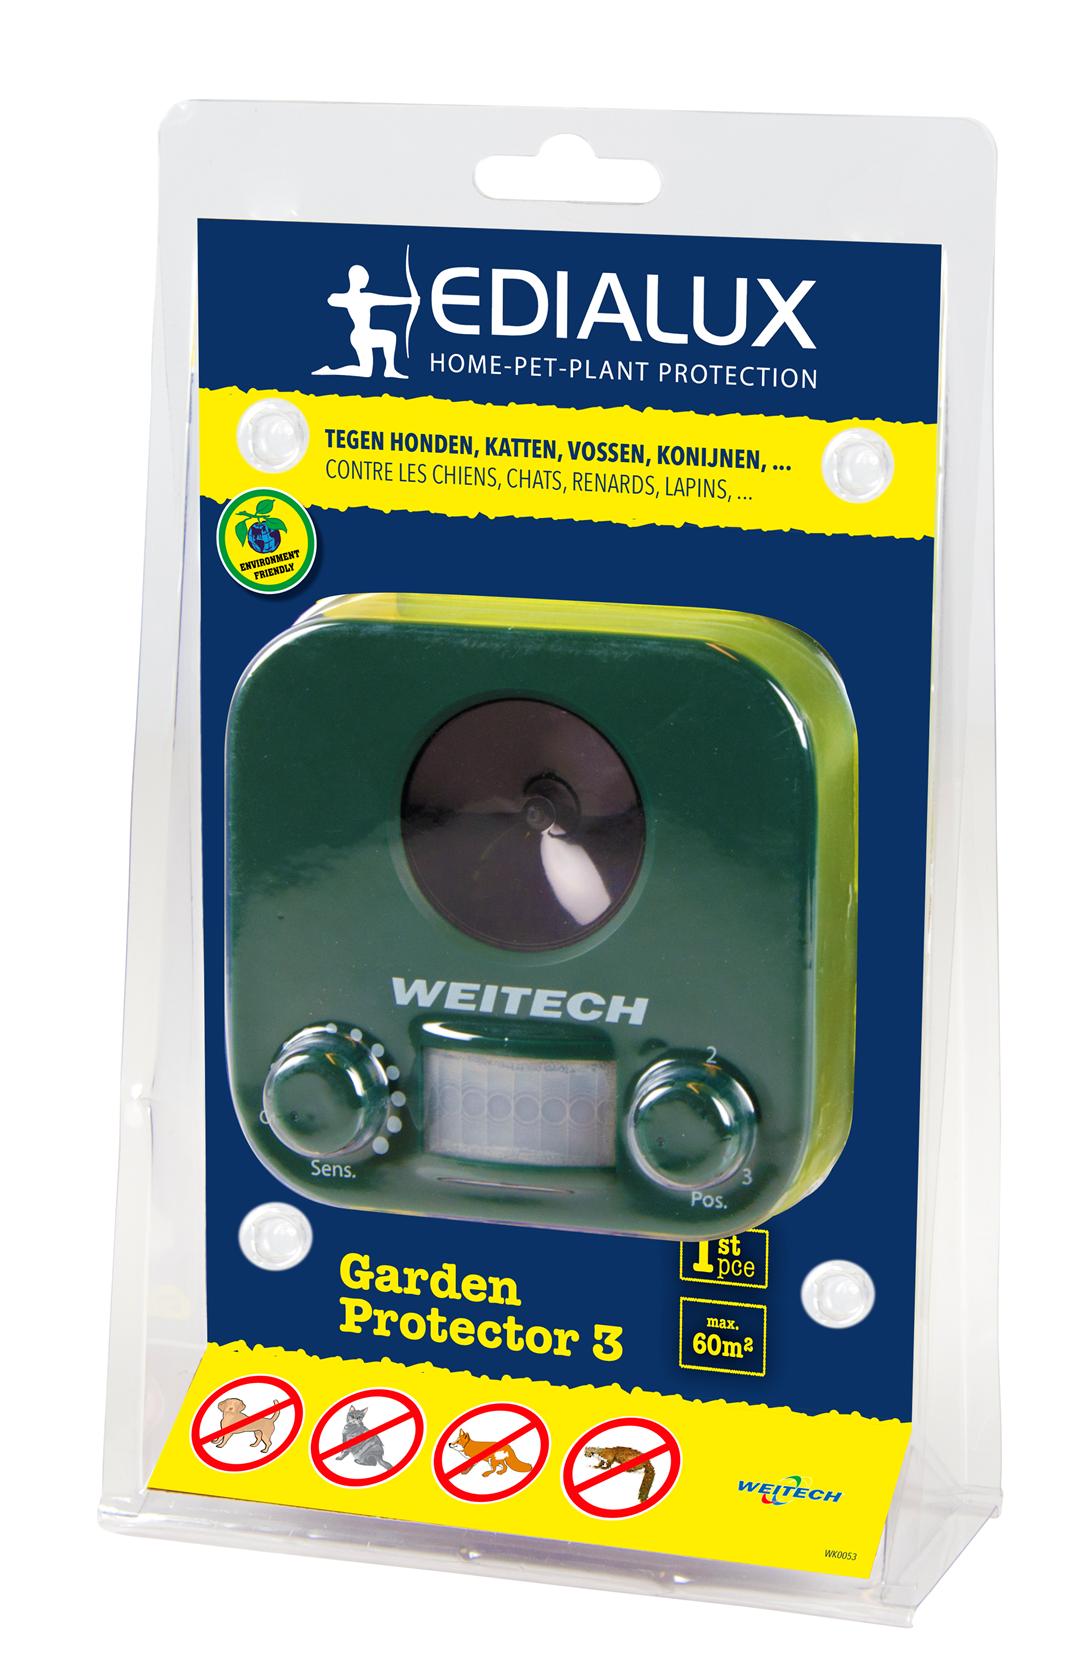 Ultrasonic-Garden-Protector-3-1-st